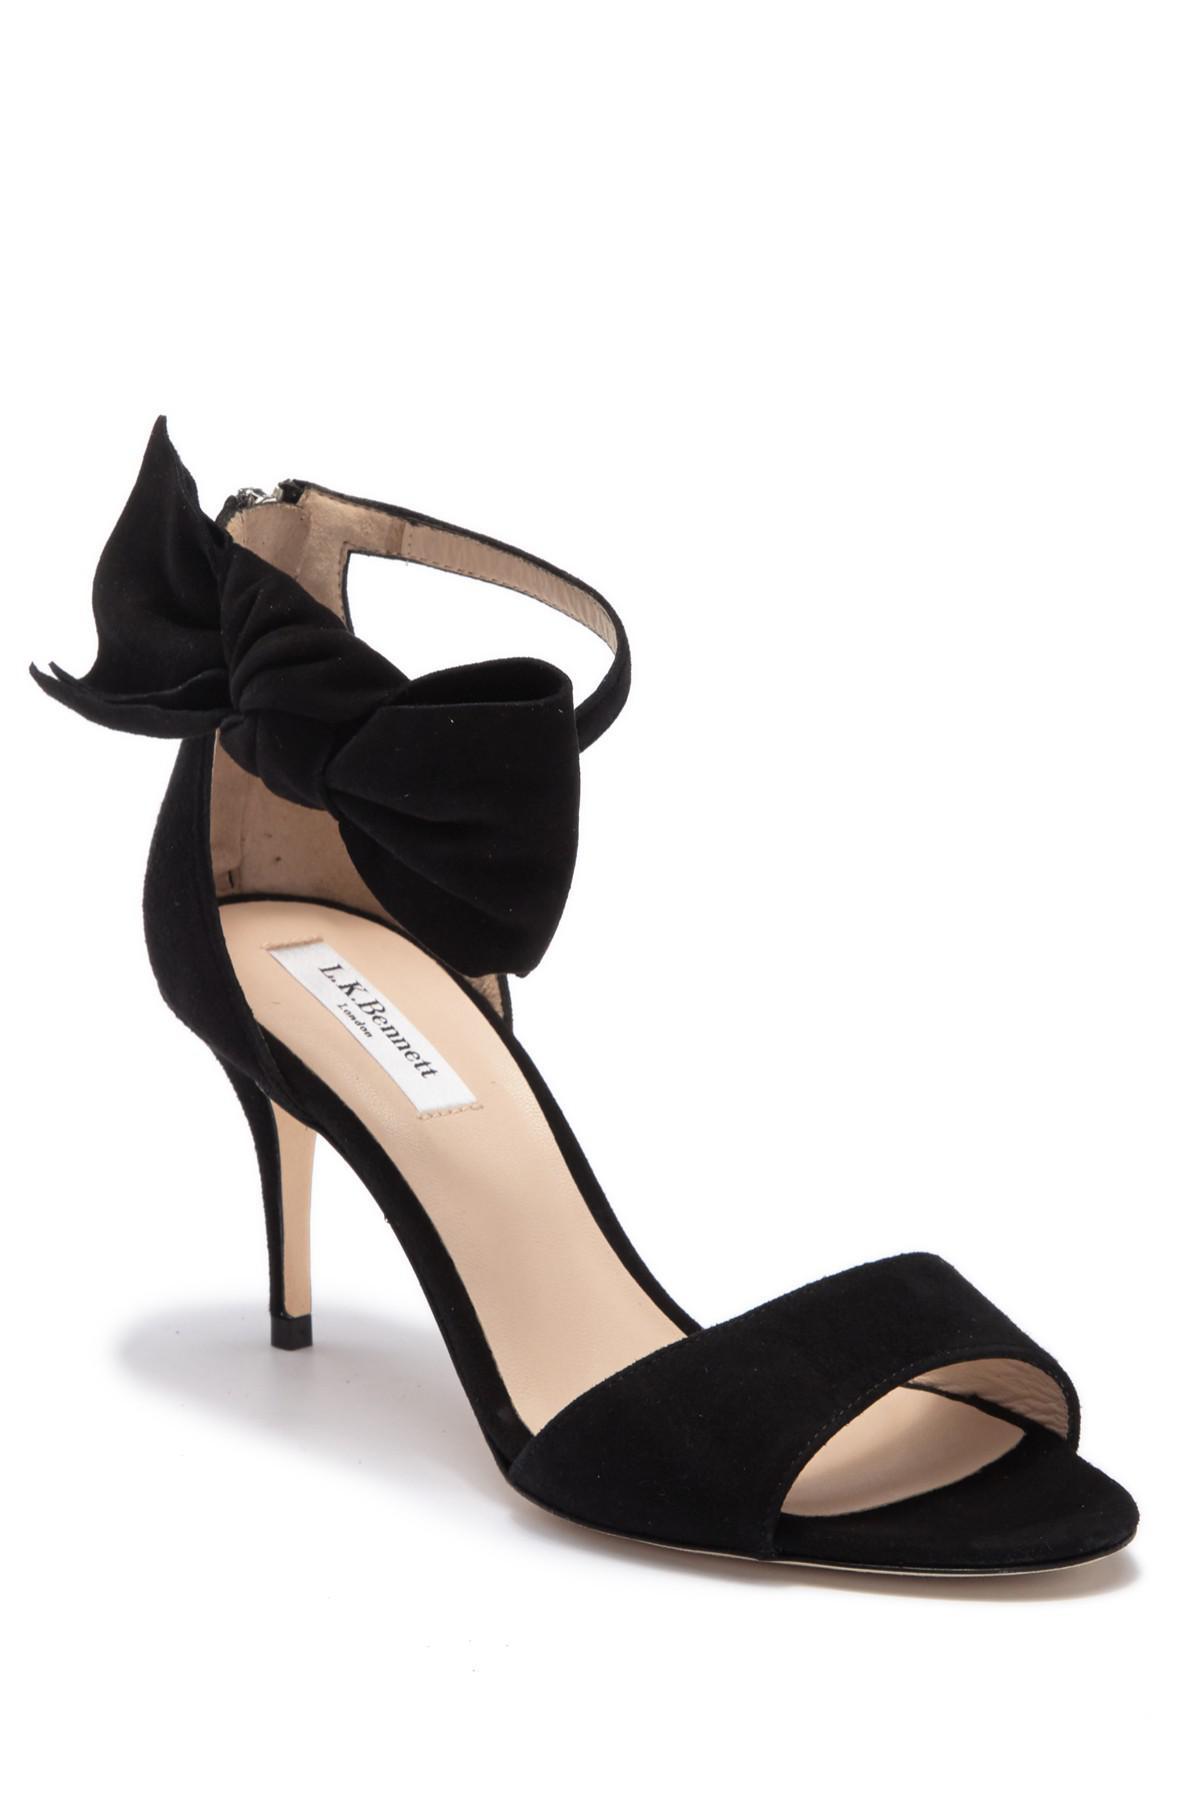 4874842a8b9506 Lyst - L.K.Bennett Agata Ankle Tie Sandal in Black